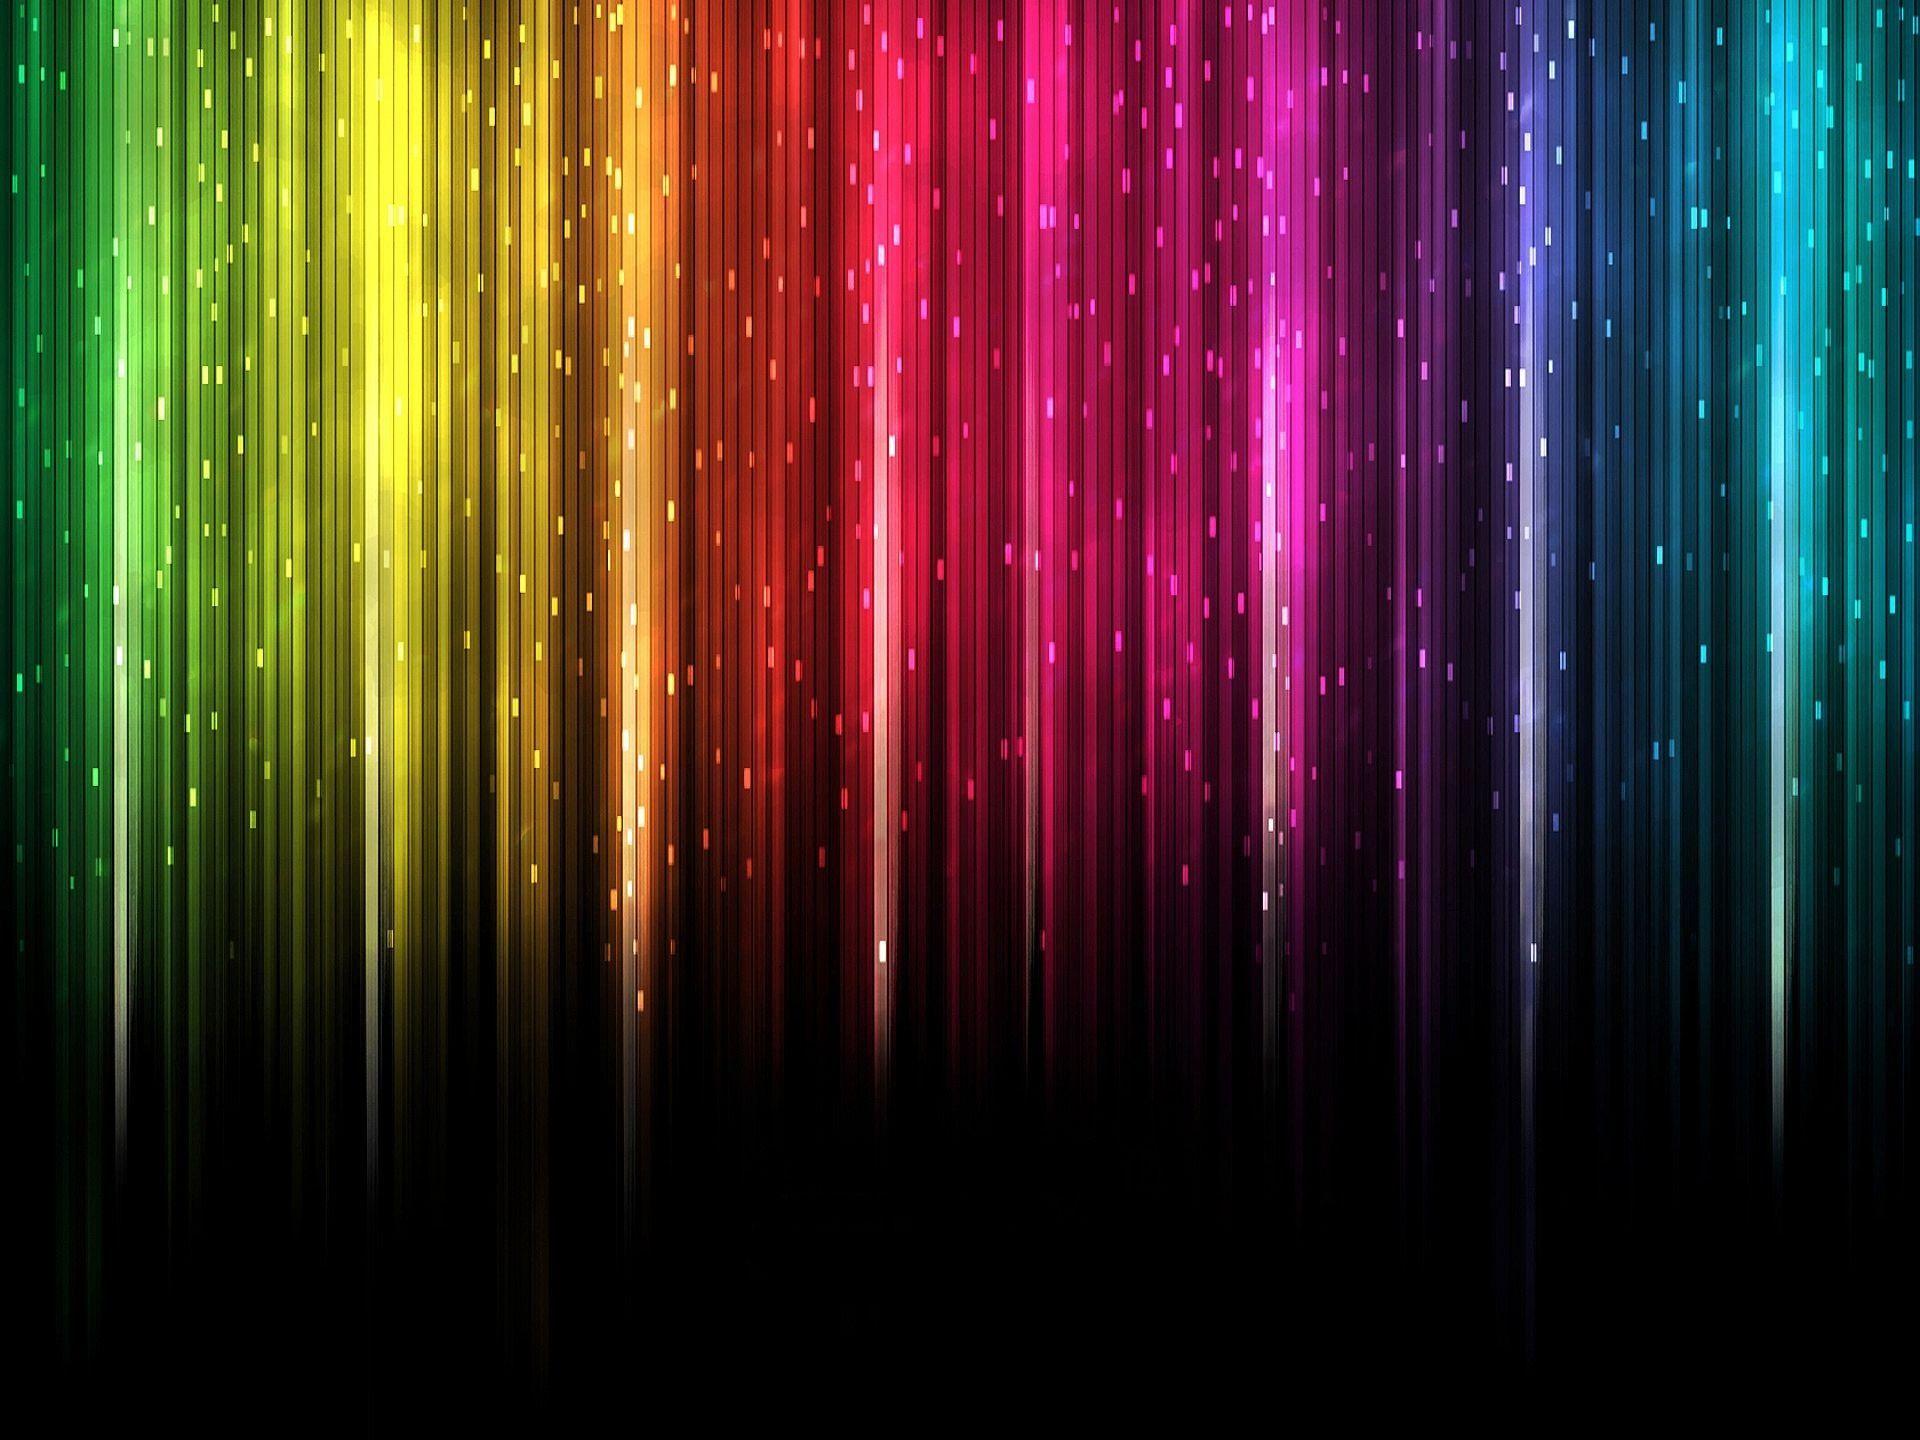 Bright Color Background Wallpaper 87610 Wallpapersfree Wallpapers Rainbow Wallpaper Colorful Backgrounds Bright Coloured Wallpaper